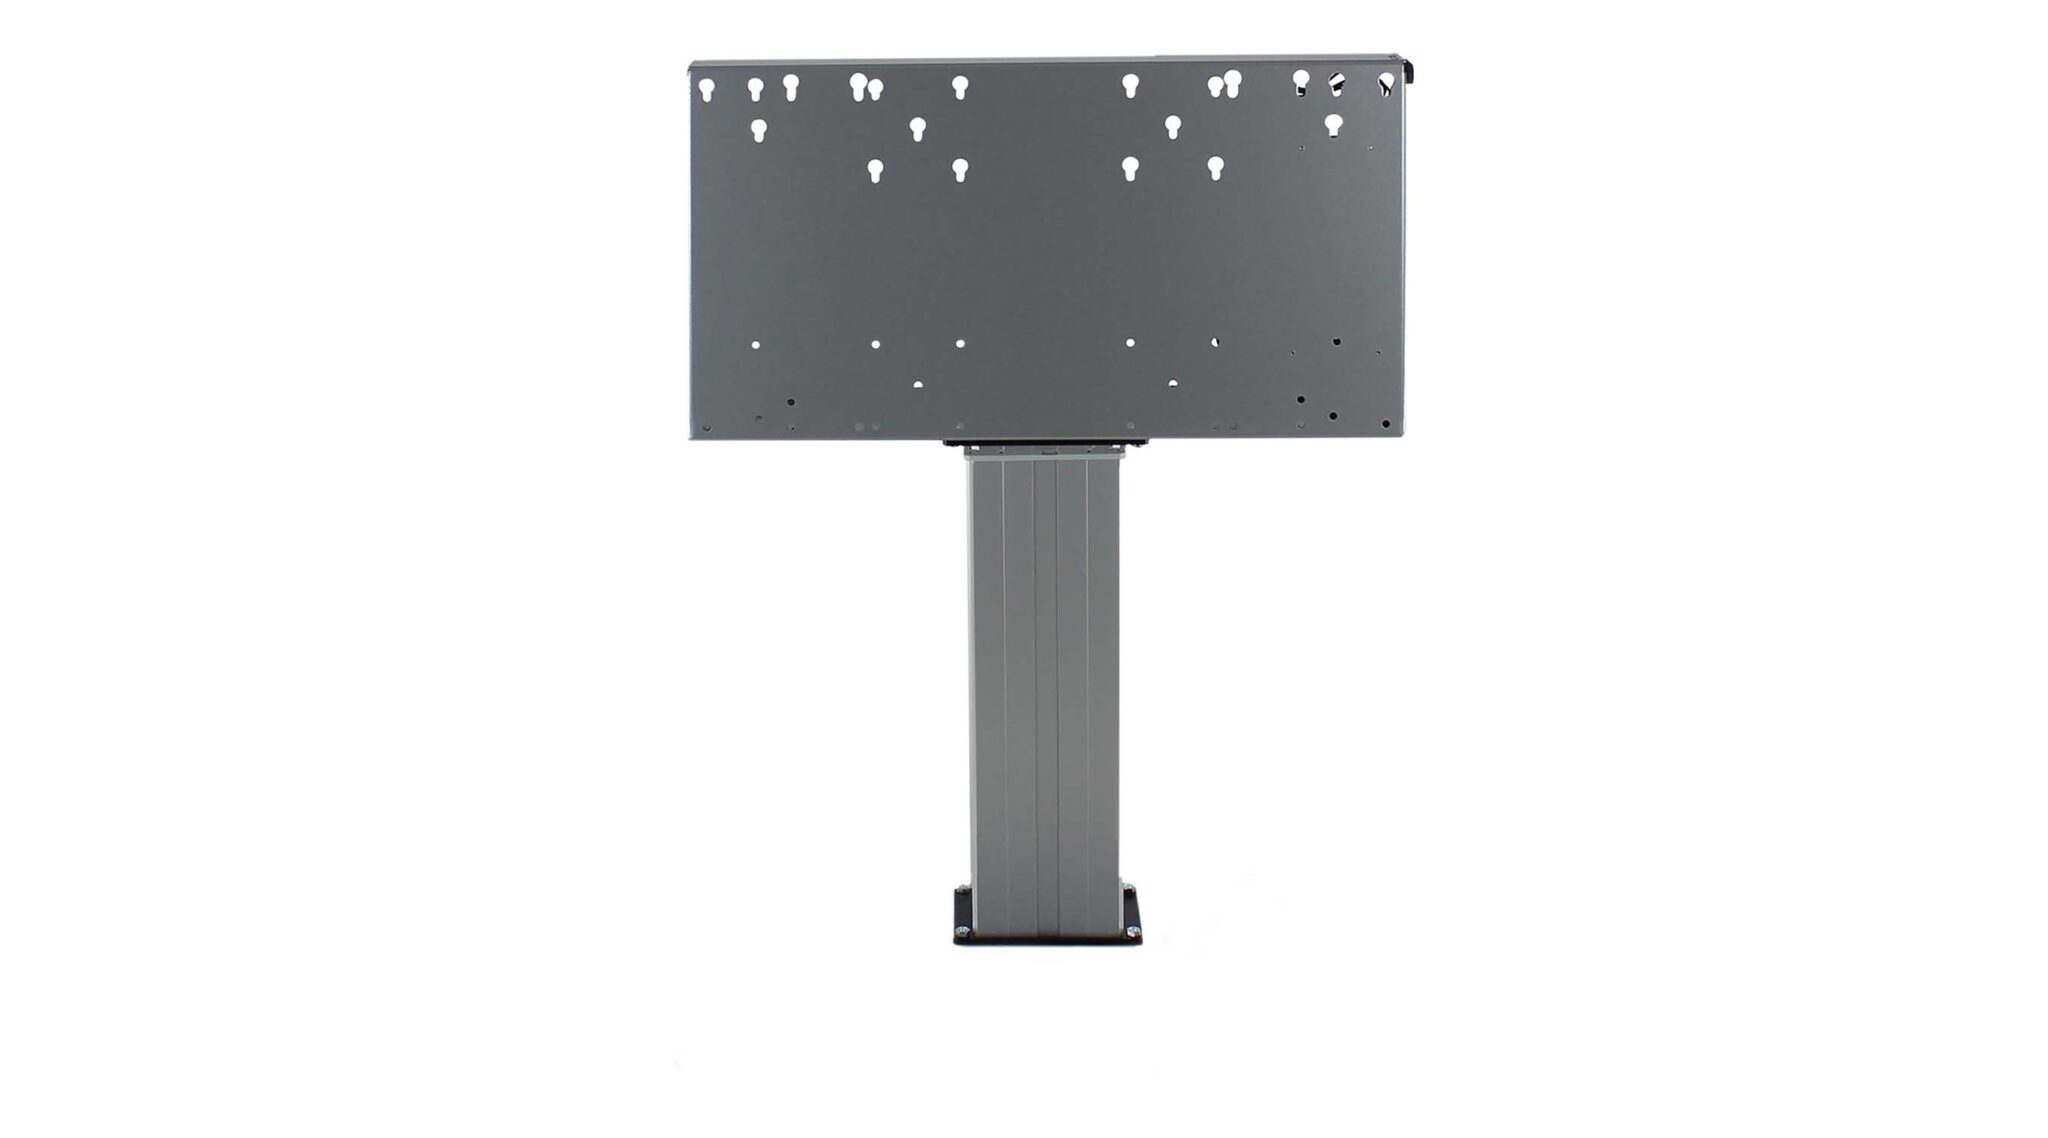 SMART Board vloerkolom wandlift elektrisch verstelbaar in hoogte